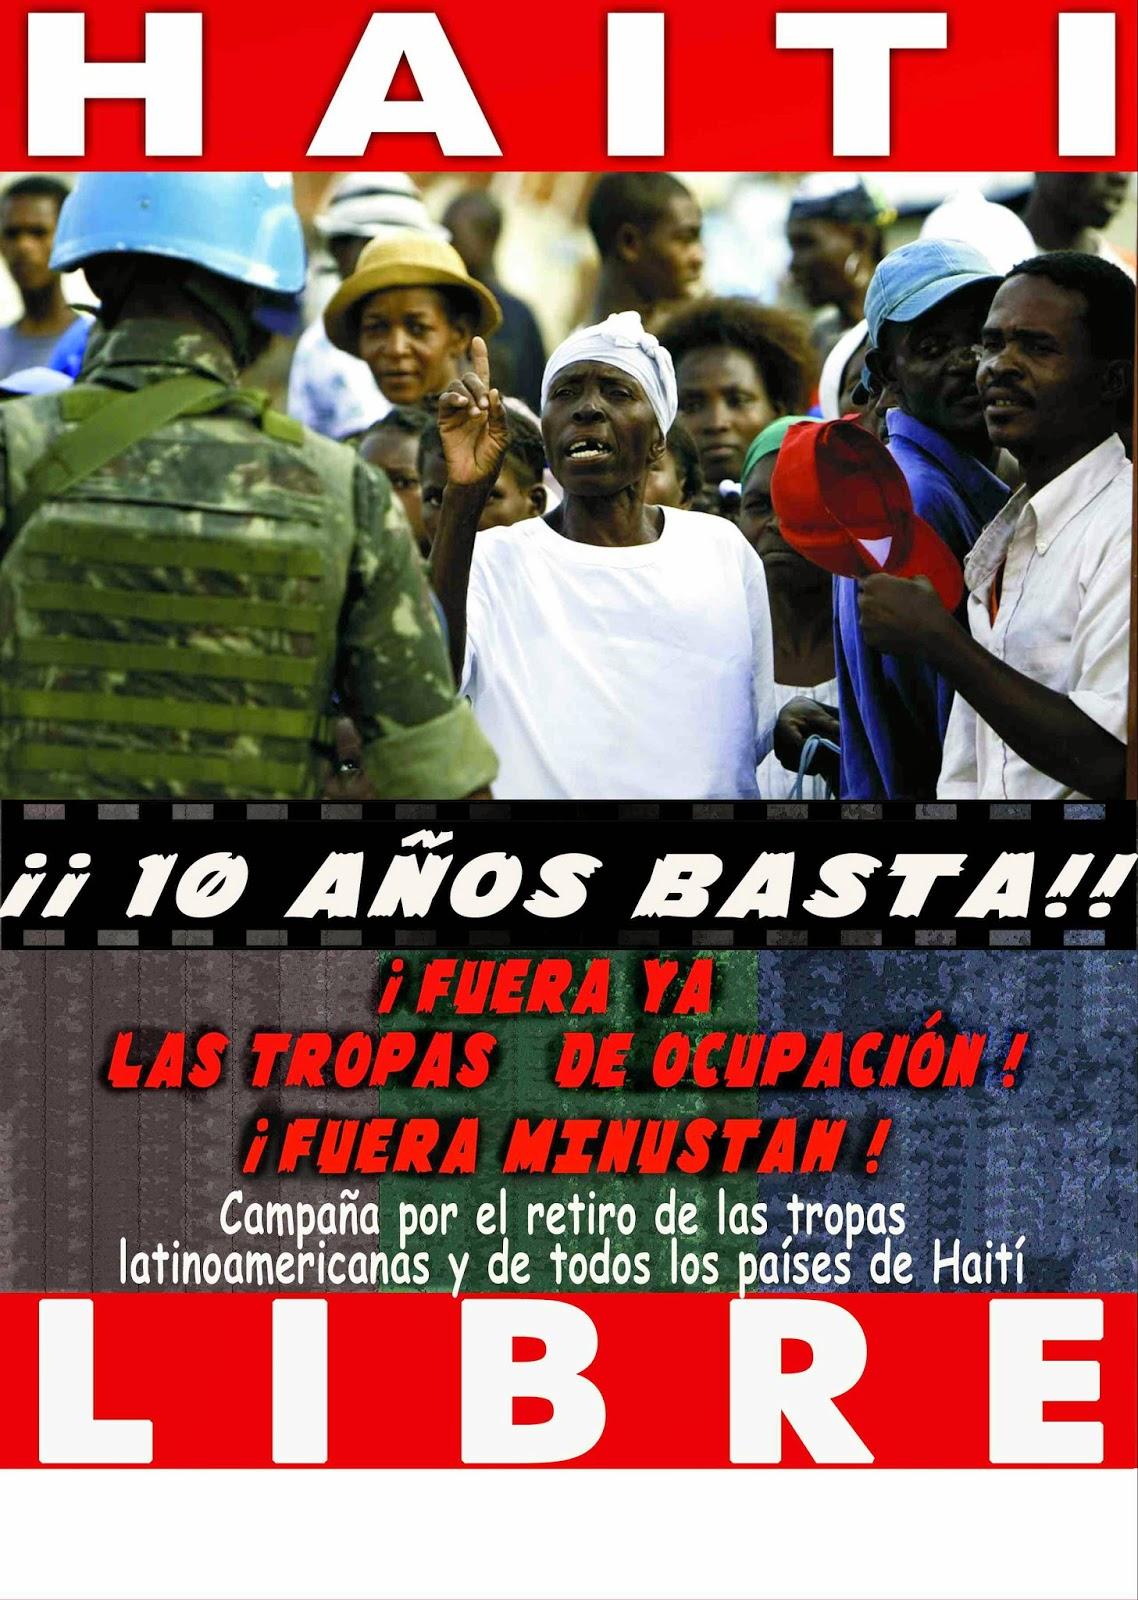 http://2.bp.blogspot.com/-BW3j3WAU3ZY/VA9BEGyXWAI/AAAAAAAAA6I/05qZol8rm0o/s1600/Haiti%CC%81%2BLibre%2Bbaja.jpg